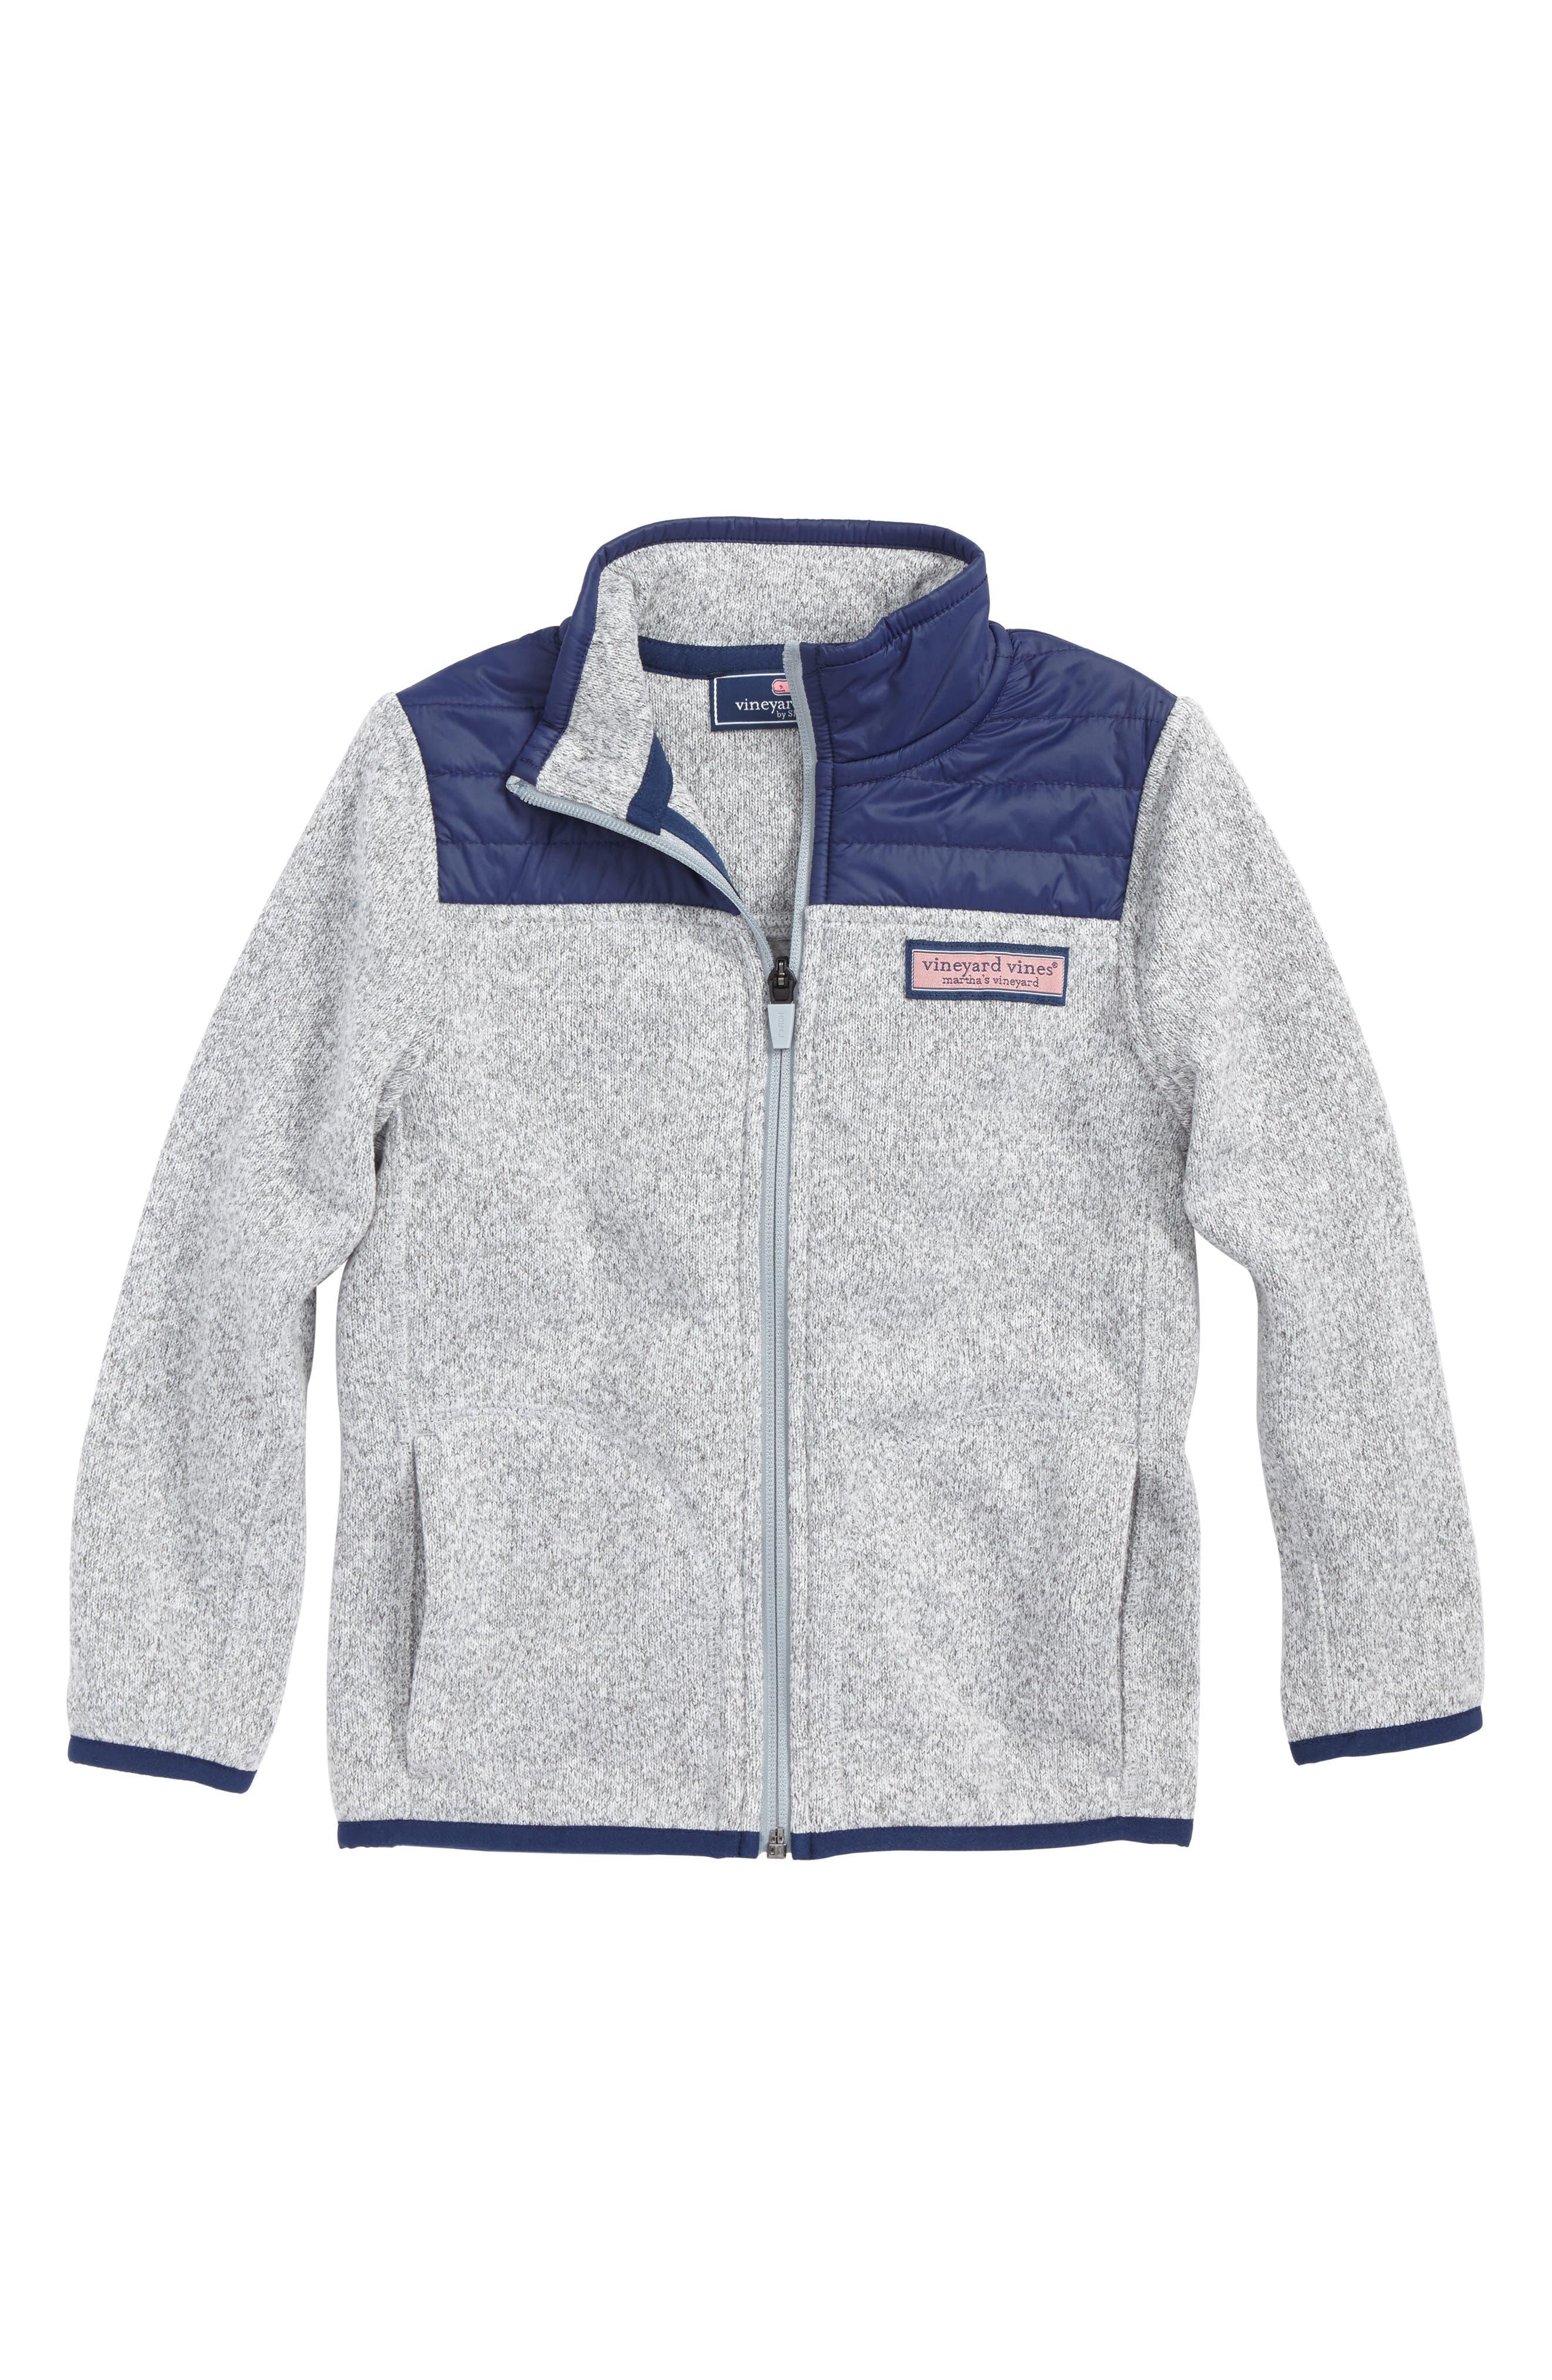 Full Zip Fleece Jacket,                             Main thumbnail 1, color,                             039